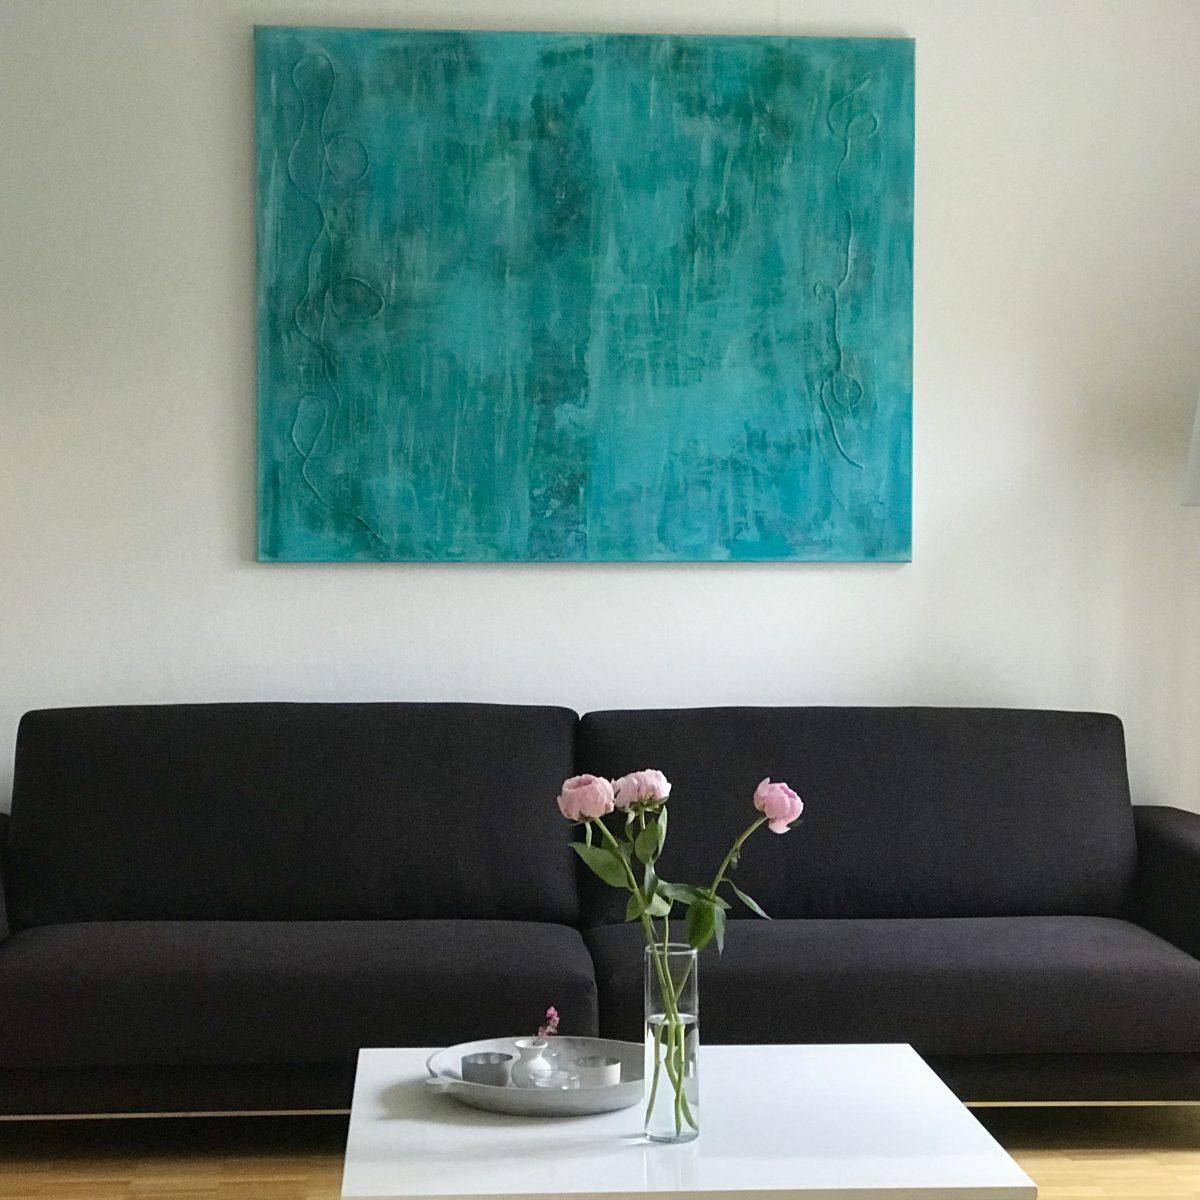 Foto von Turquoise Series Nr. 35b